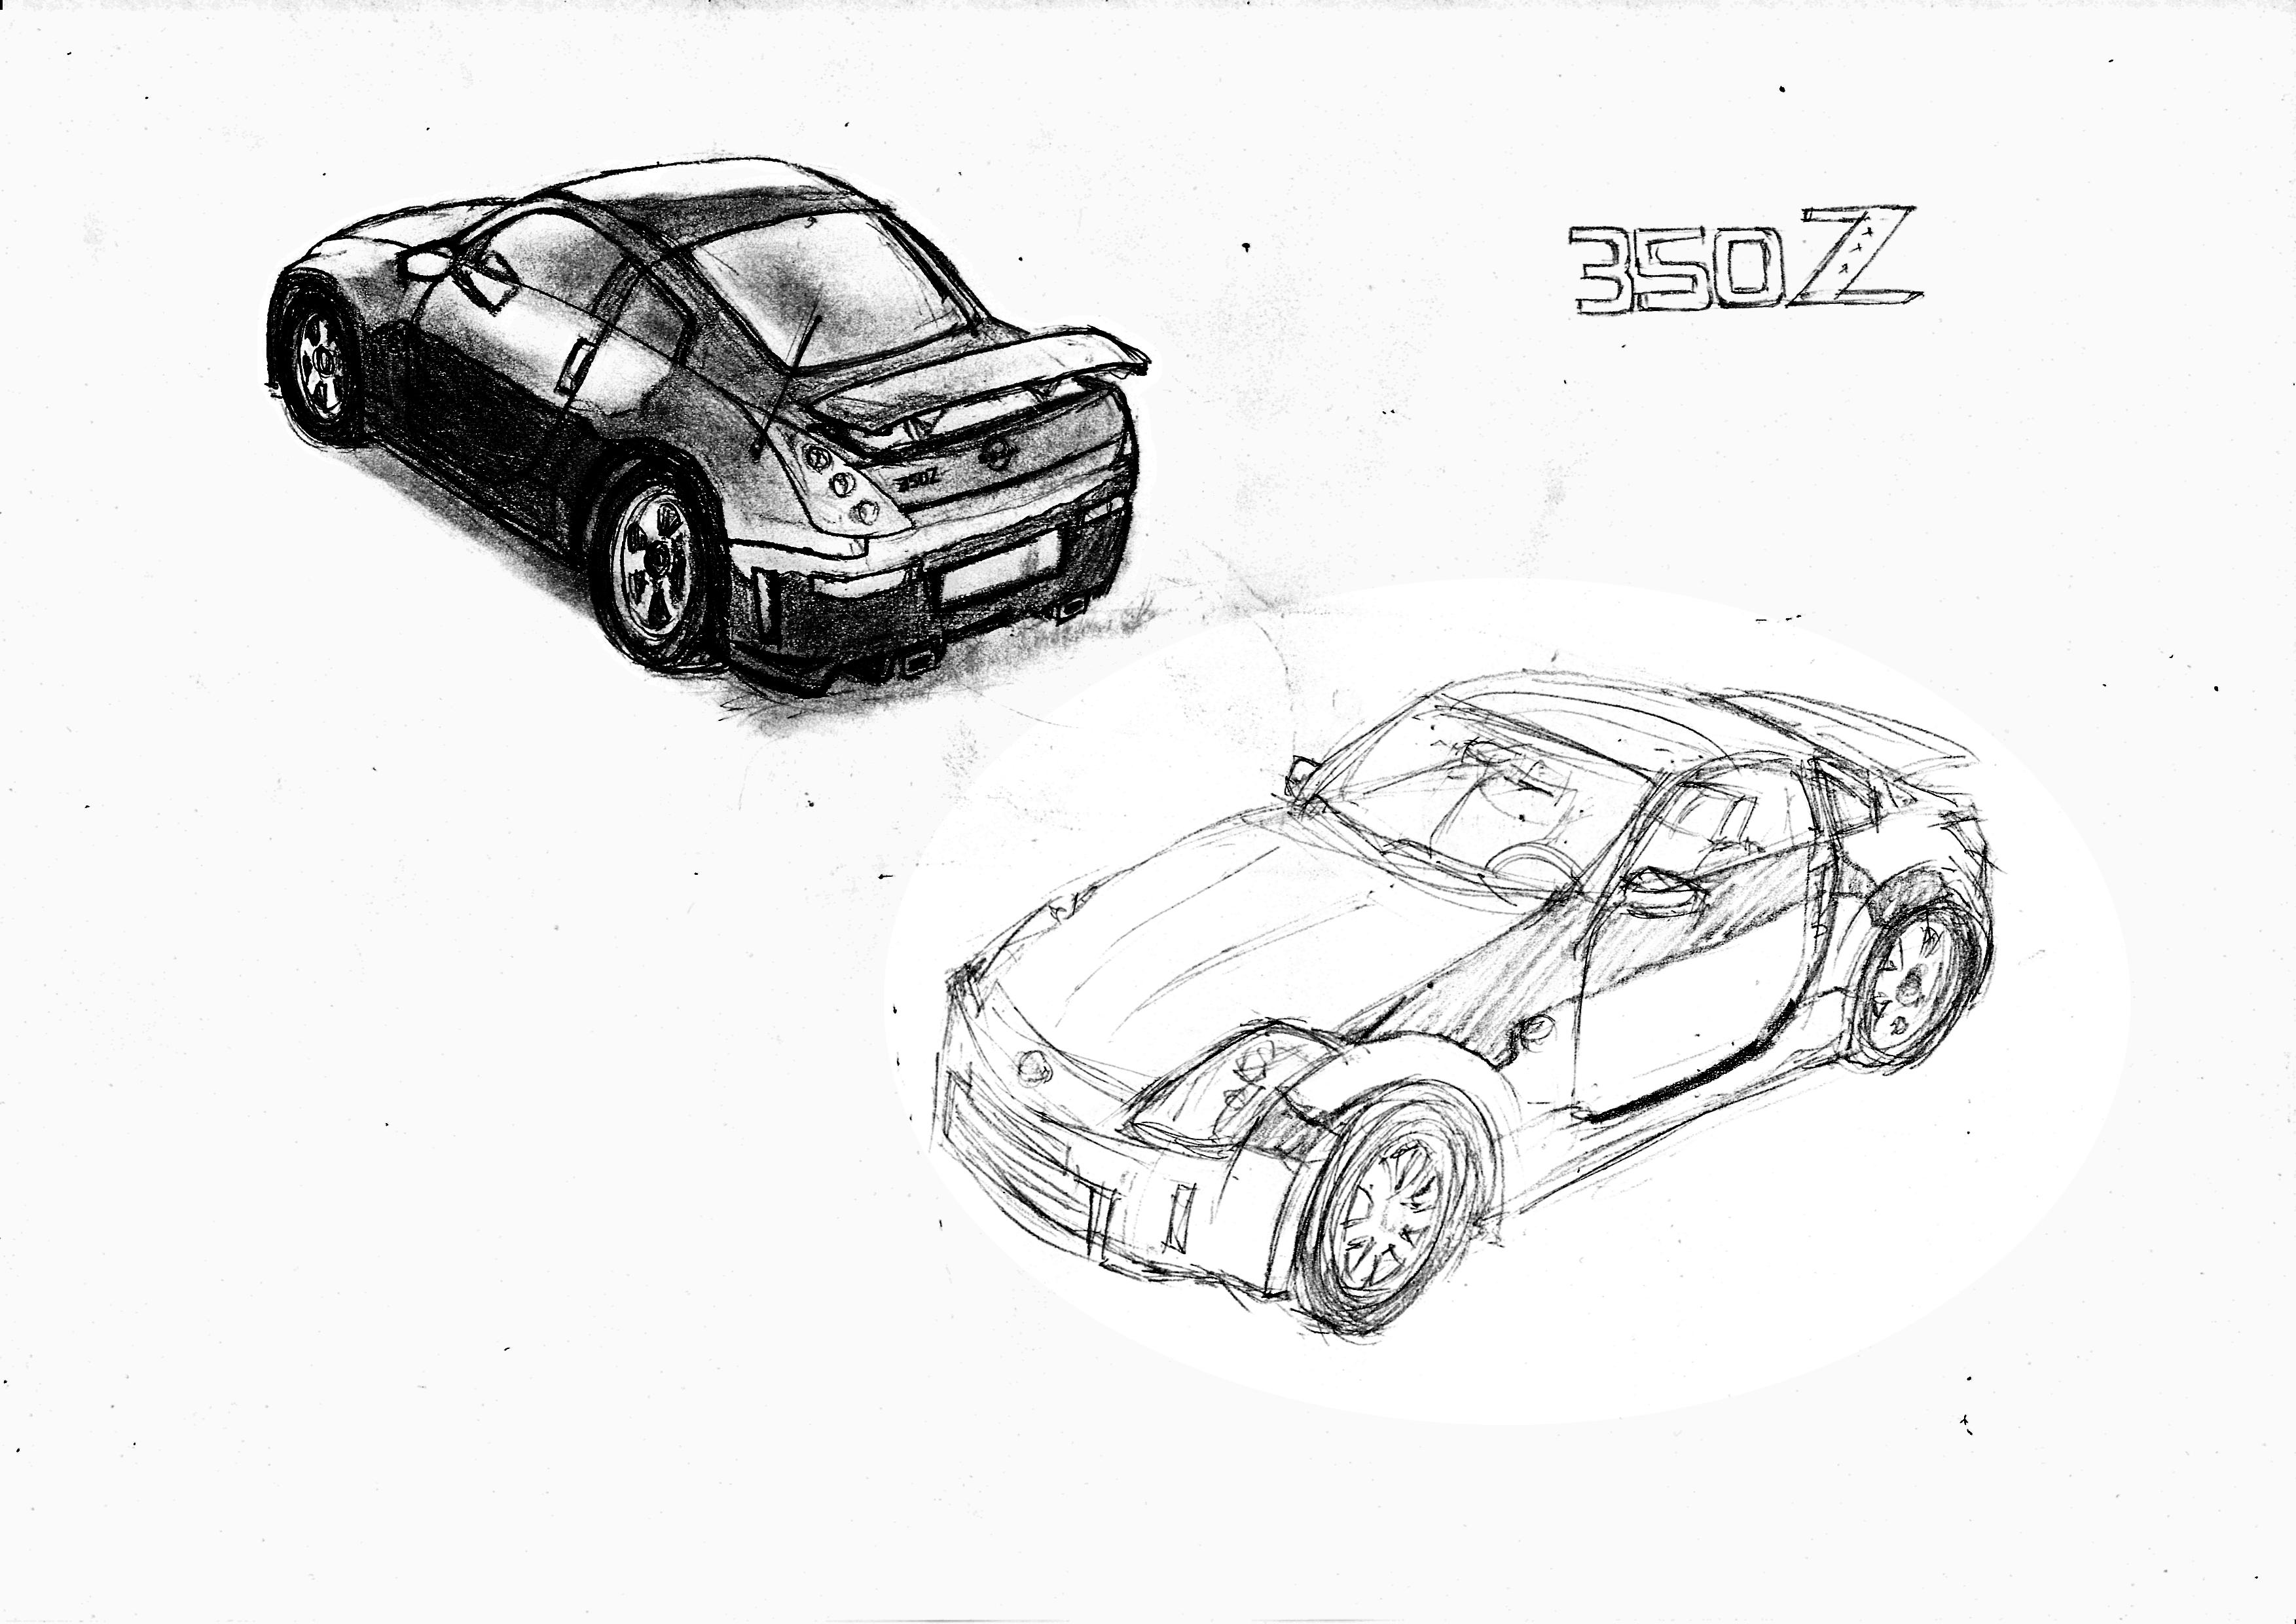 NISSAN 350Z by pensuke by LowyatClub on DeviantArt